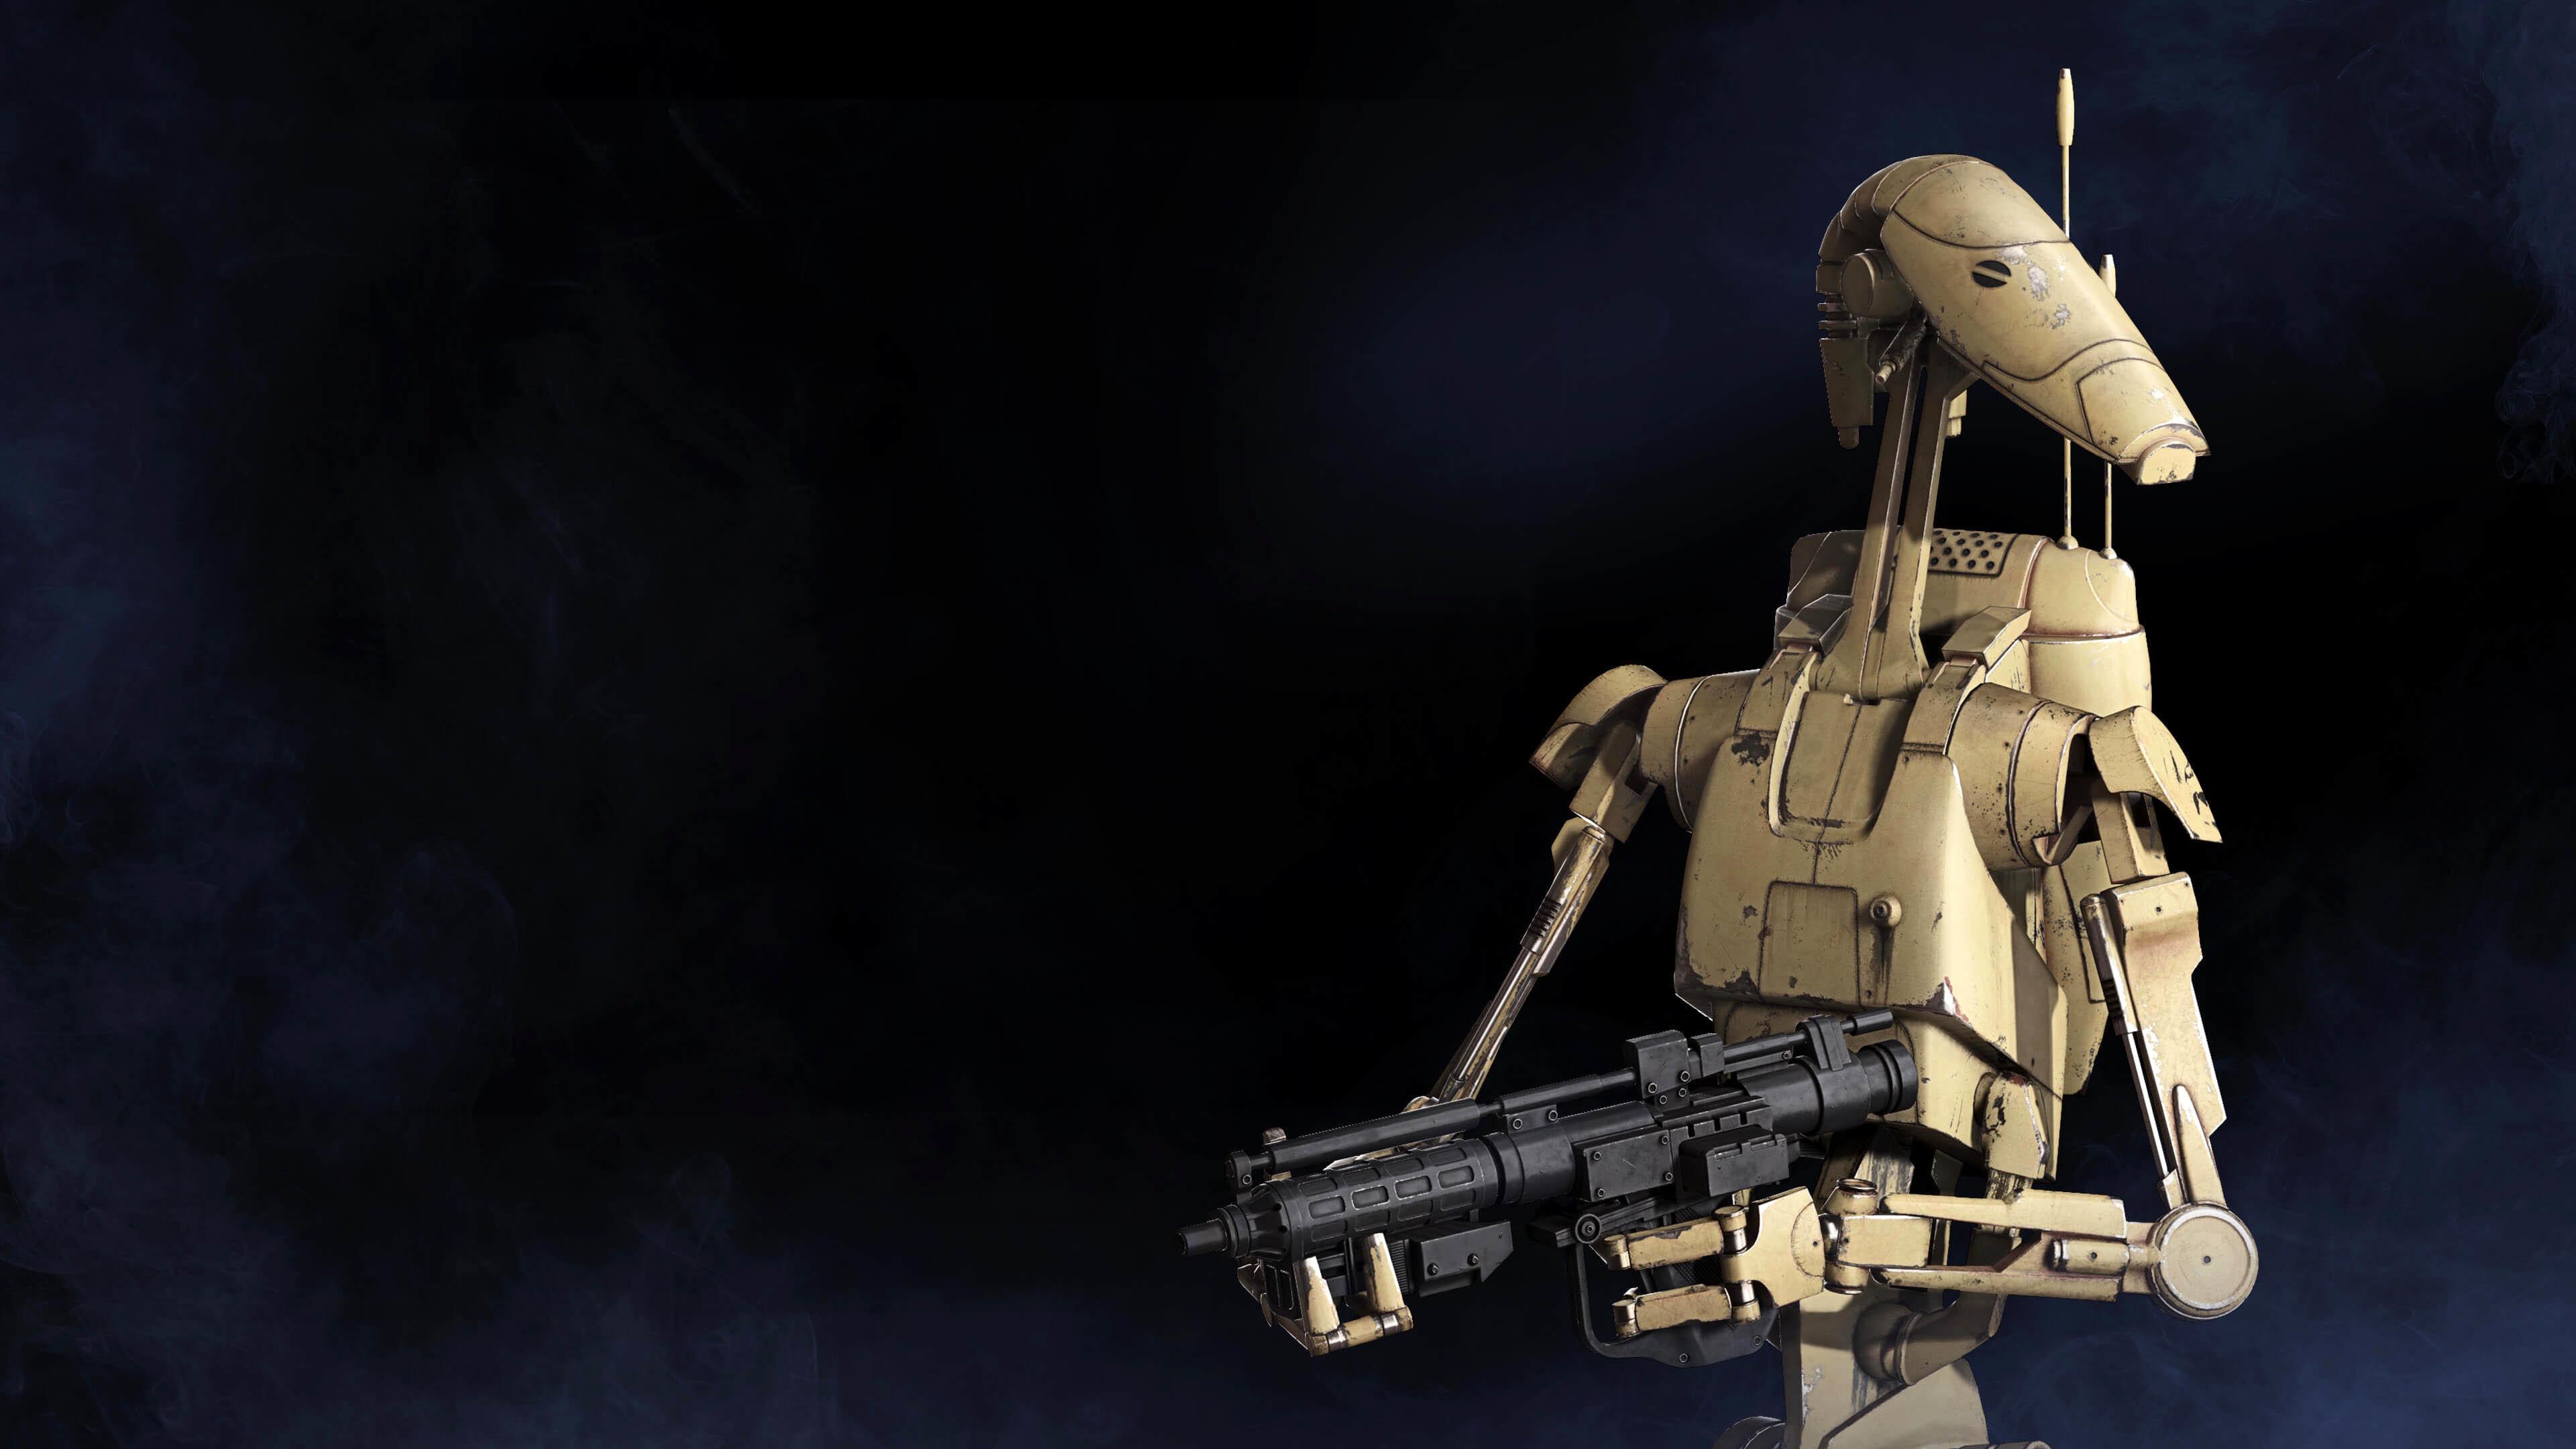 Star Wars: Battlefront II Battle droid wallpaper